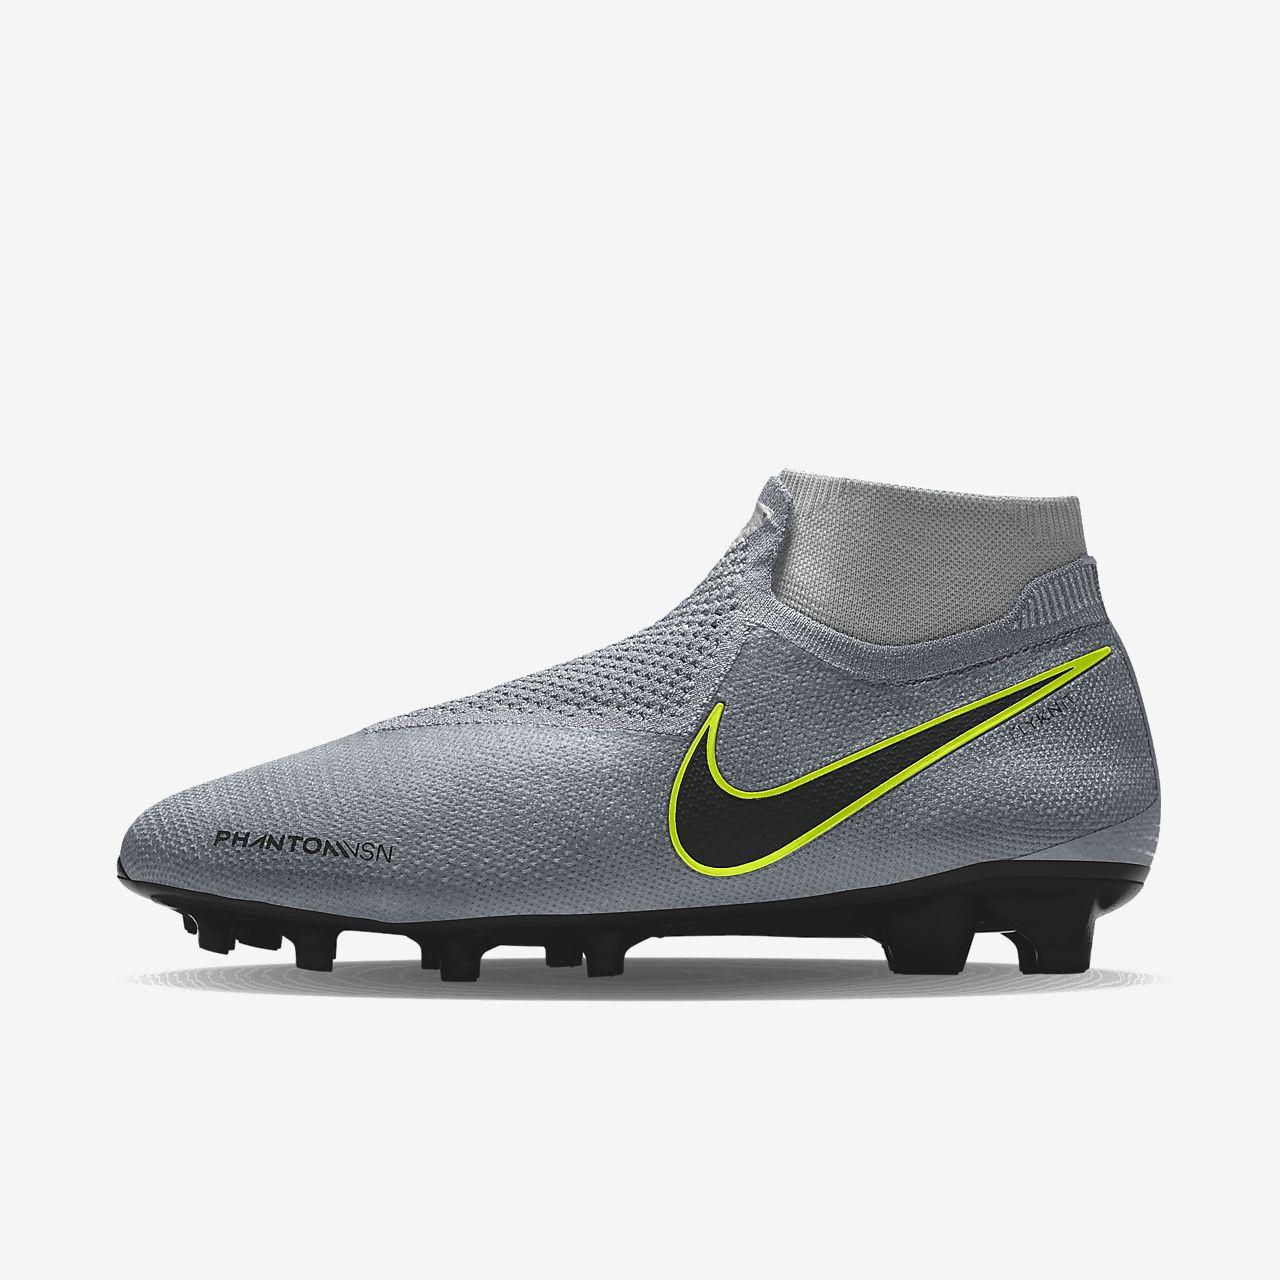 Specialdesignad fotbollssko för gräs Nike Phantom Vision Elite FG By You